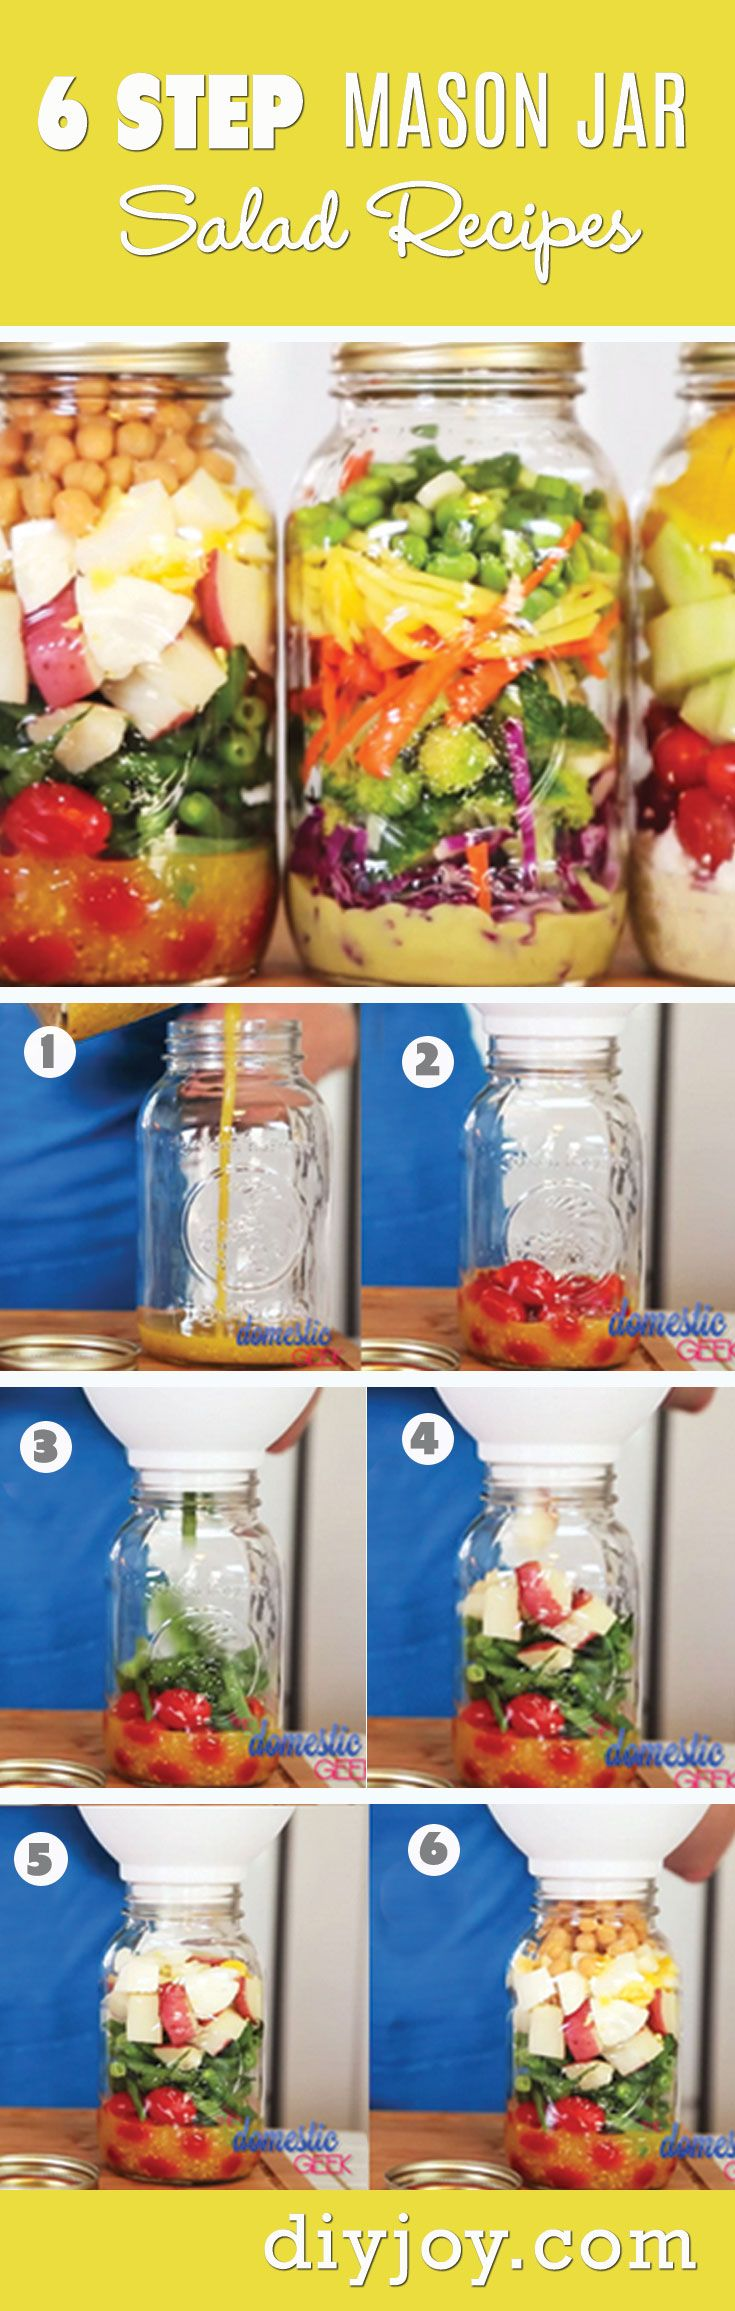 Mason Jar Salad Recipes - Recipes in A Jar and Easy Lunch Ideas